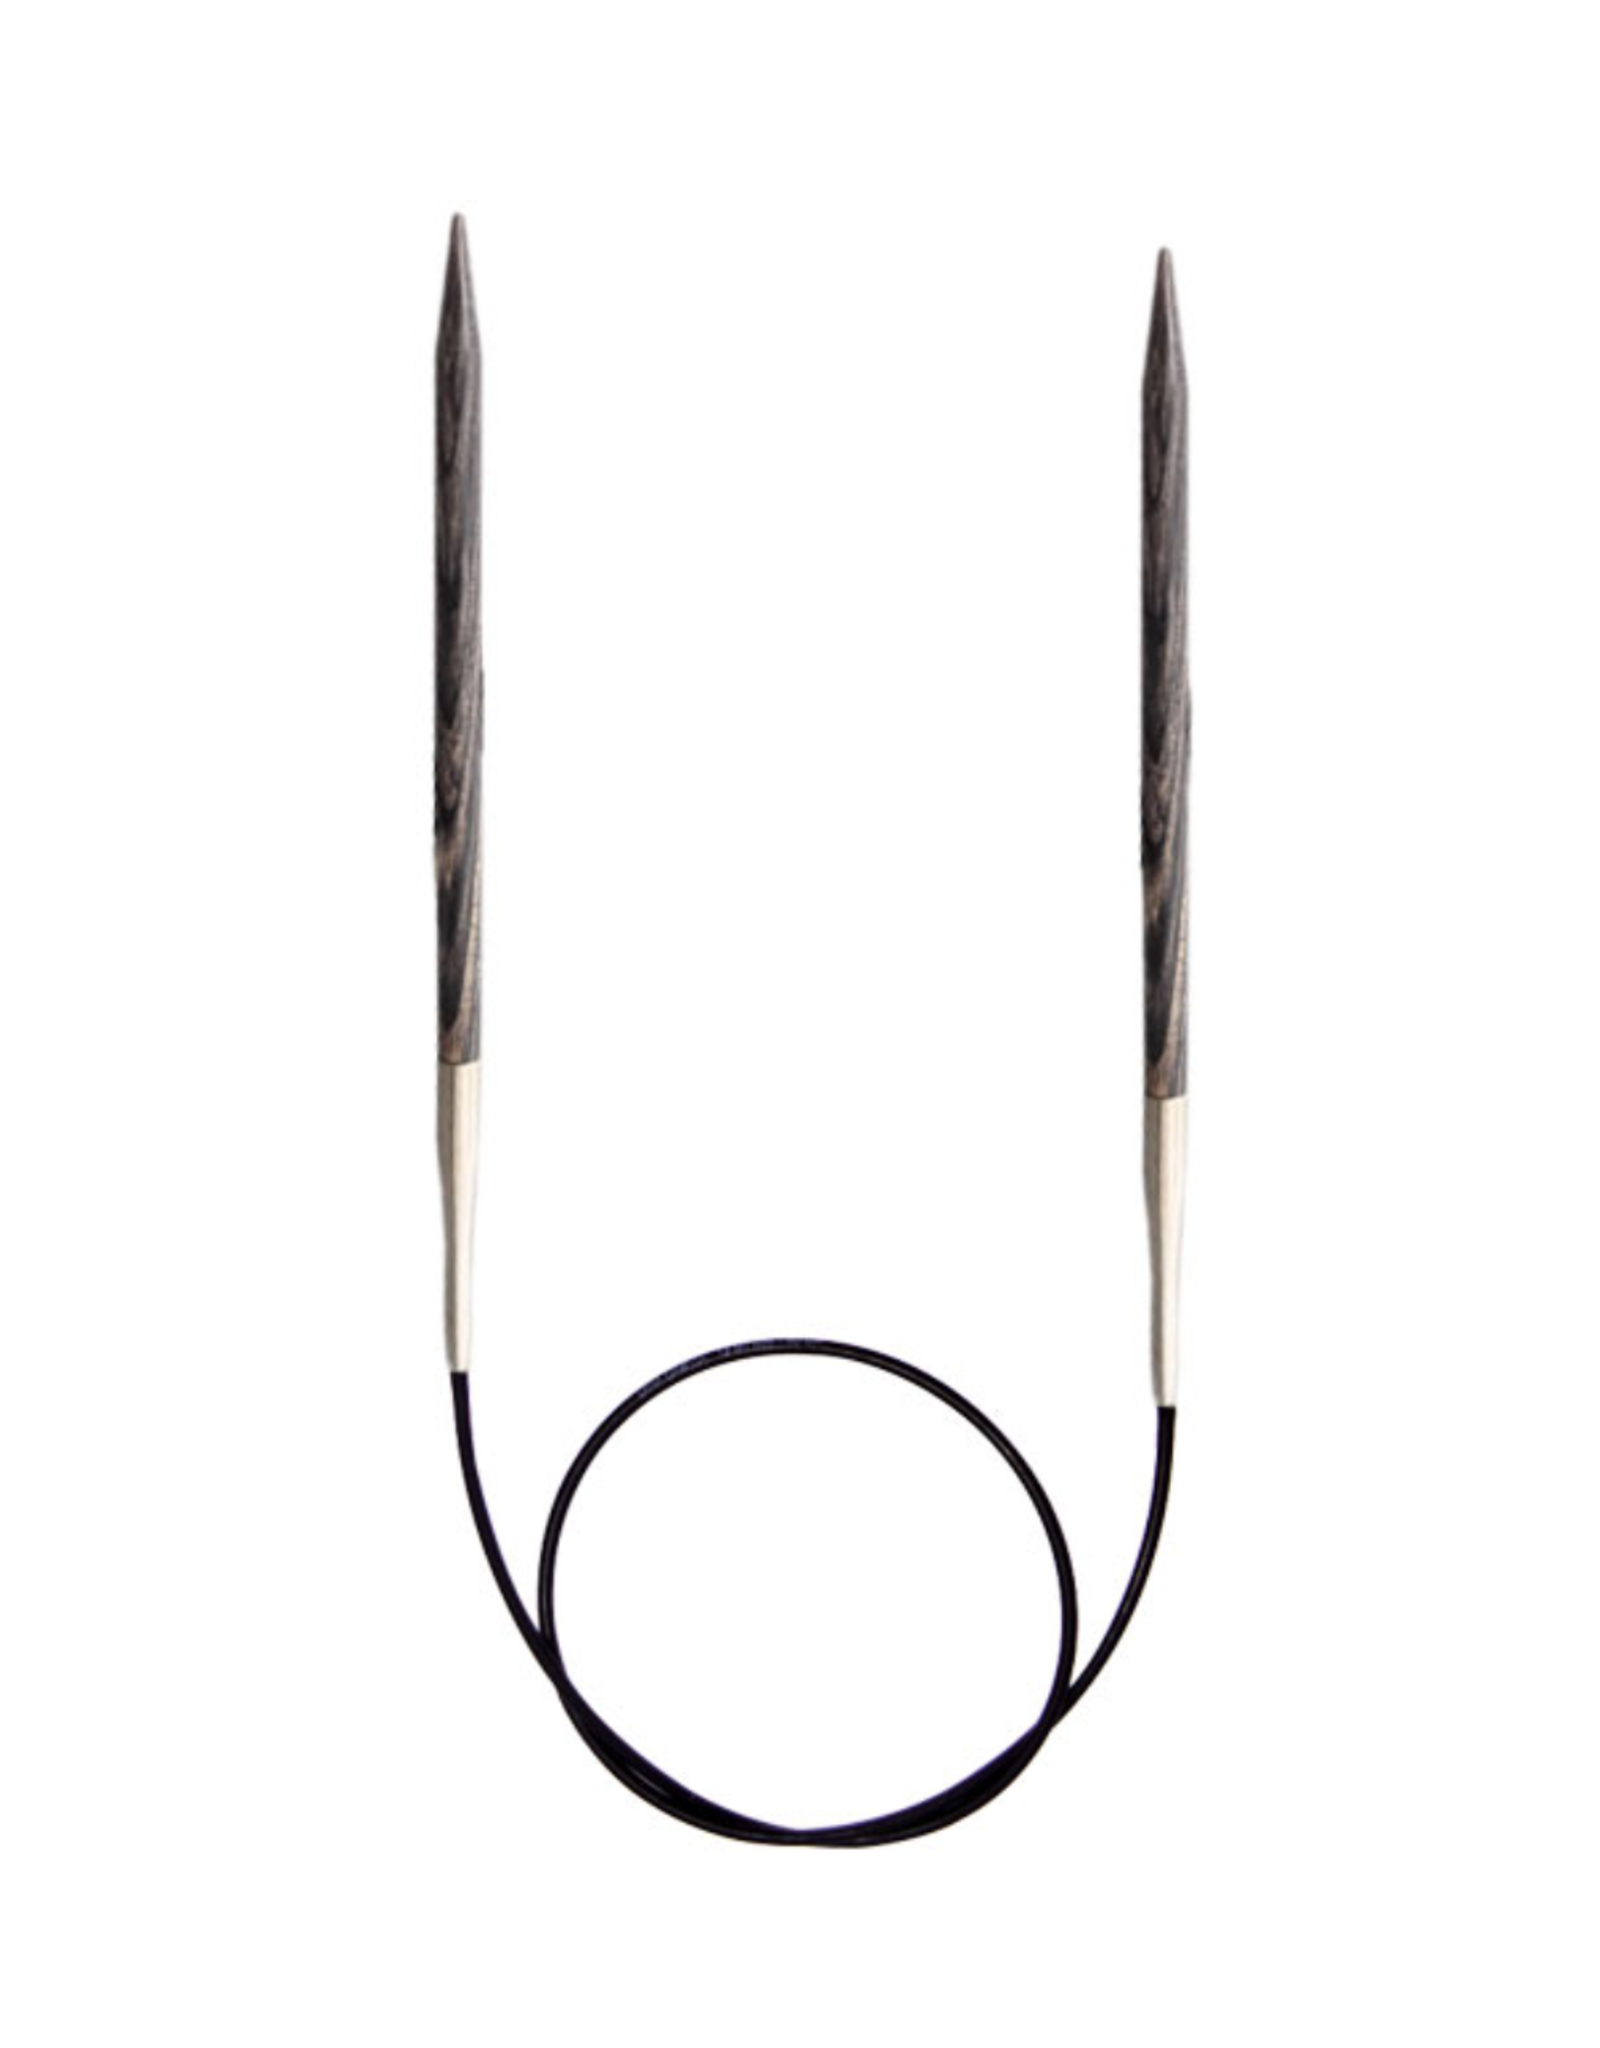 "Dreamz 24"" long circular needle size US 7"